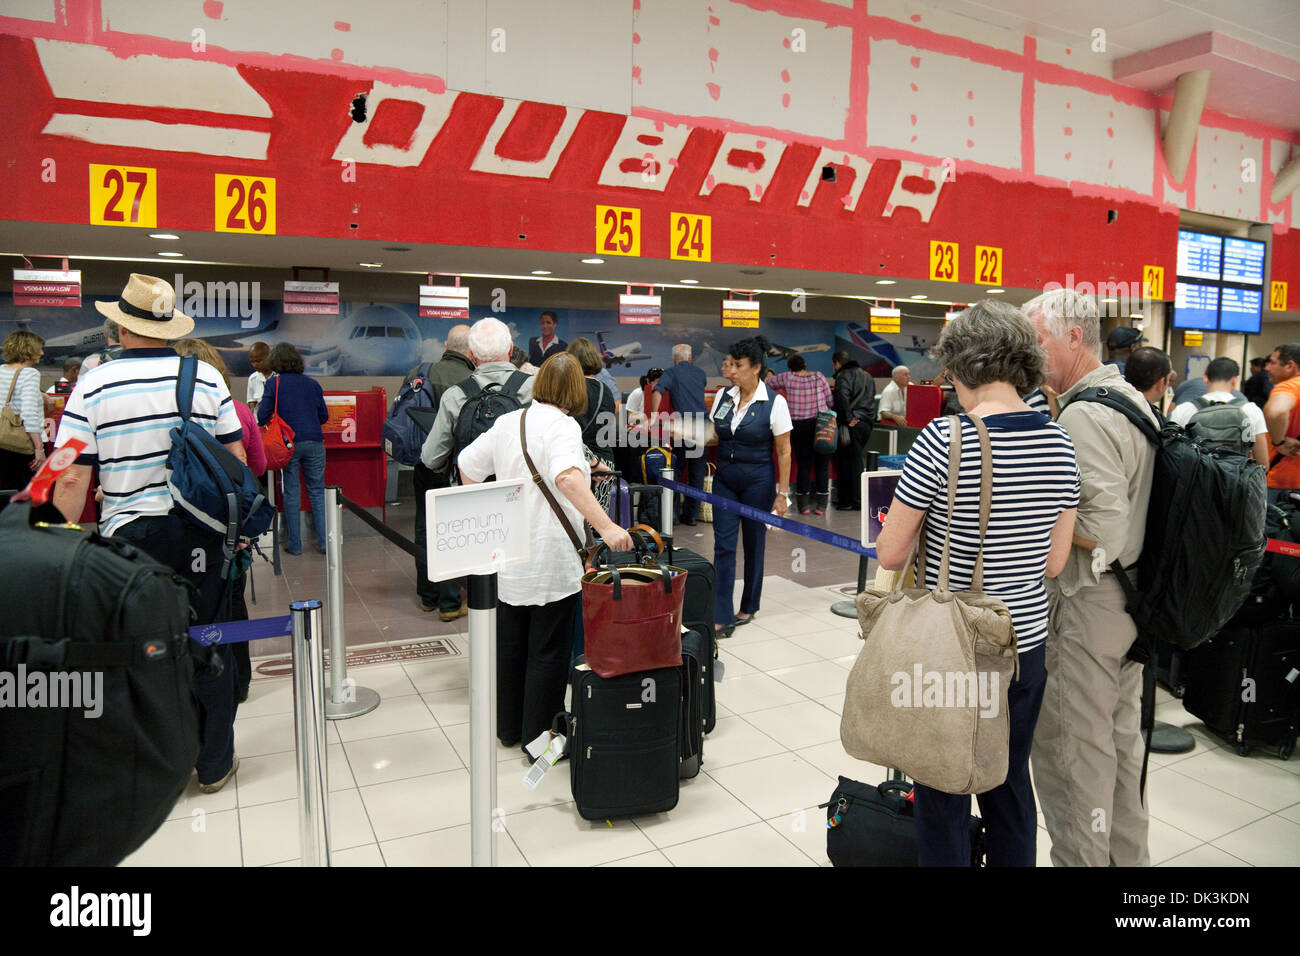 Aeroporto Havana Arrivi : Havana cuba jose marti international airport queues at the check